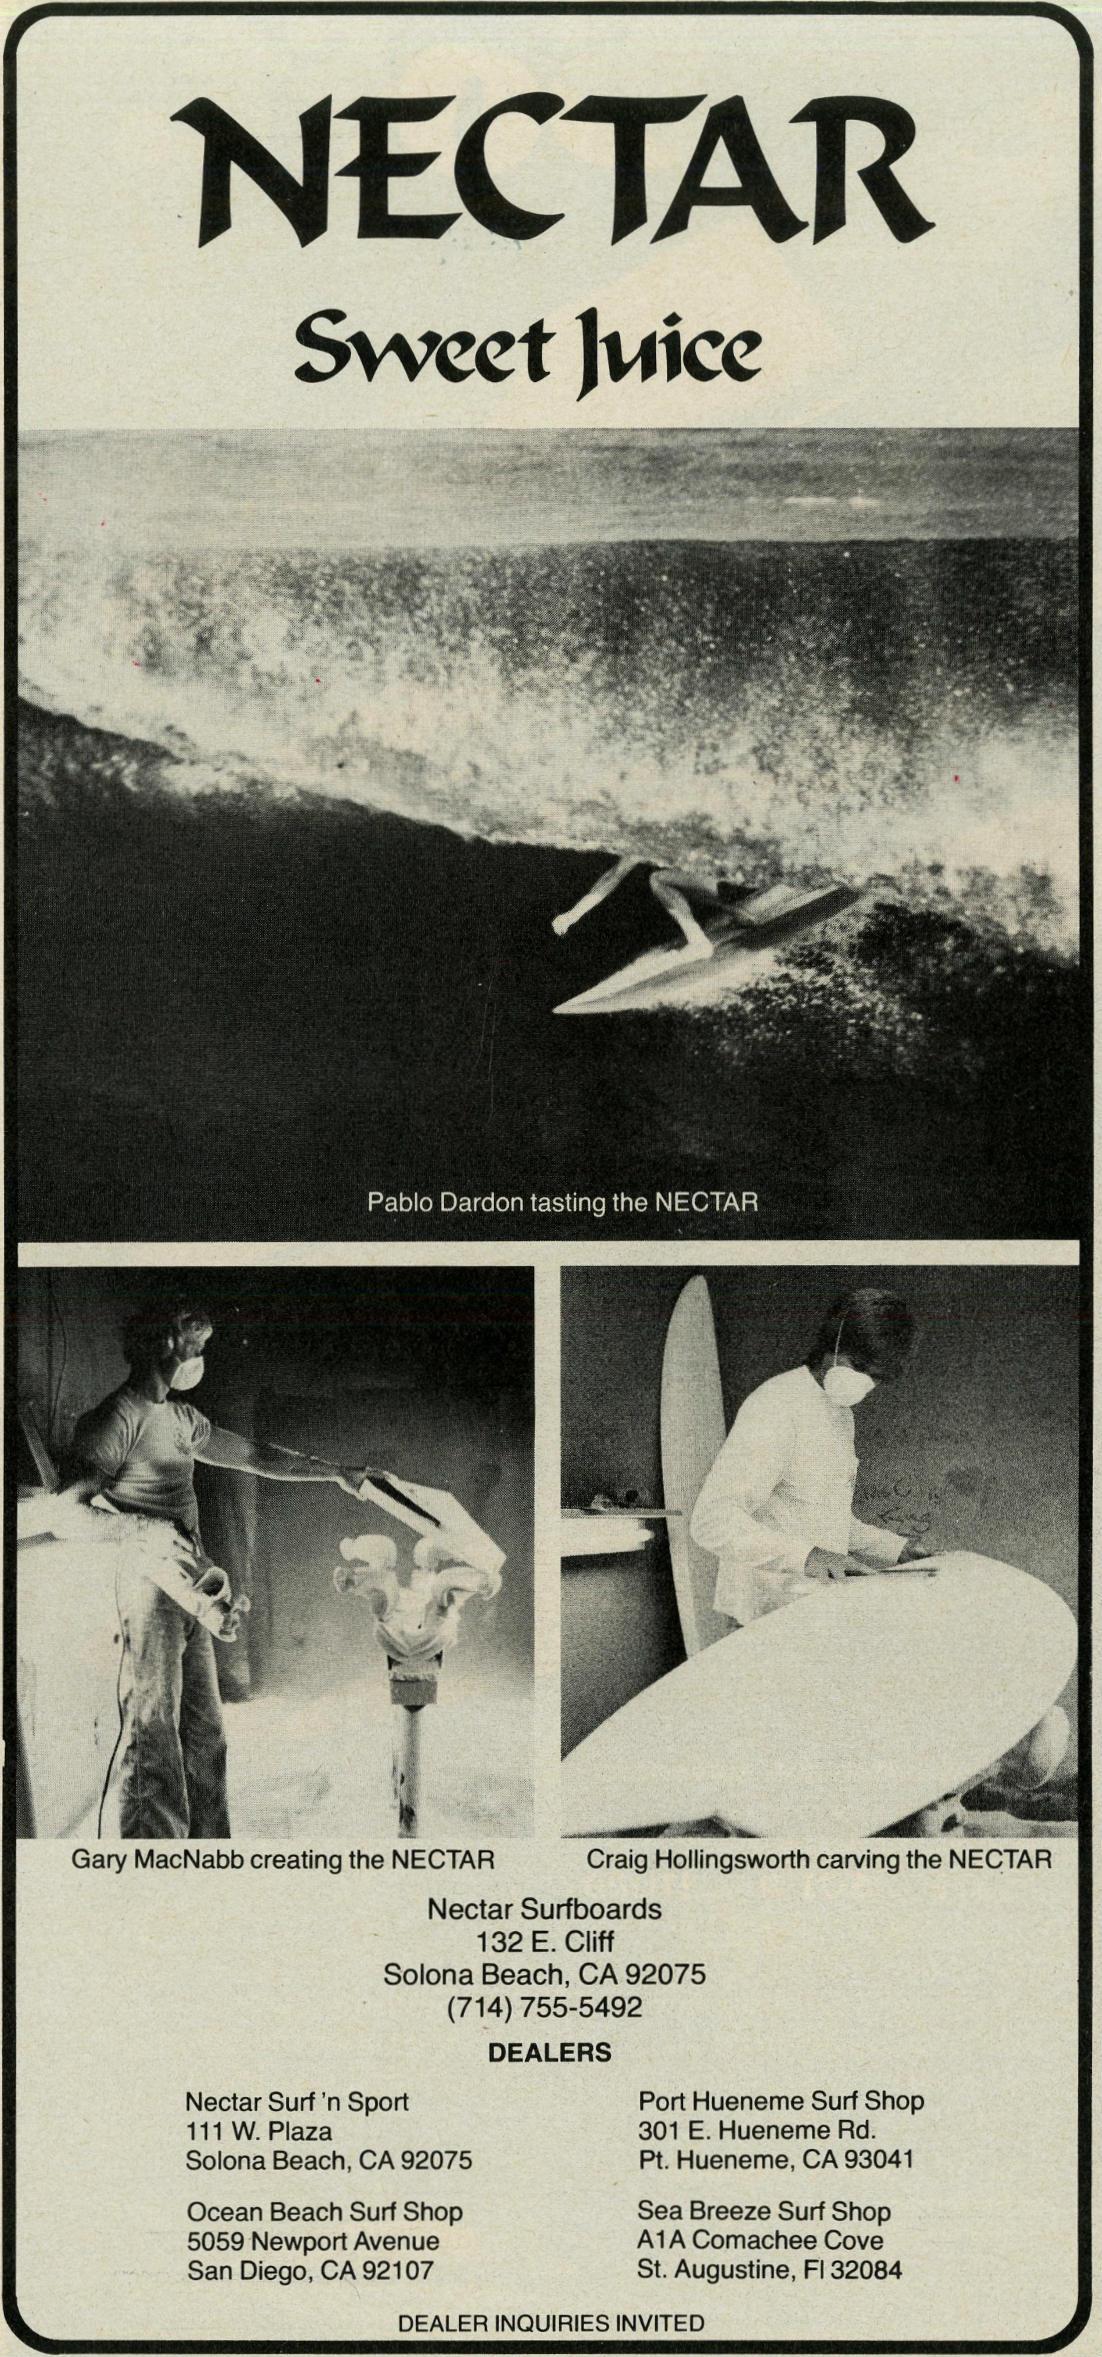 Sweet Juice via Nectar Surfboards: Sagas of Shred